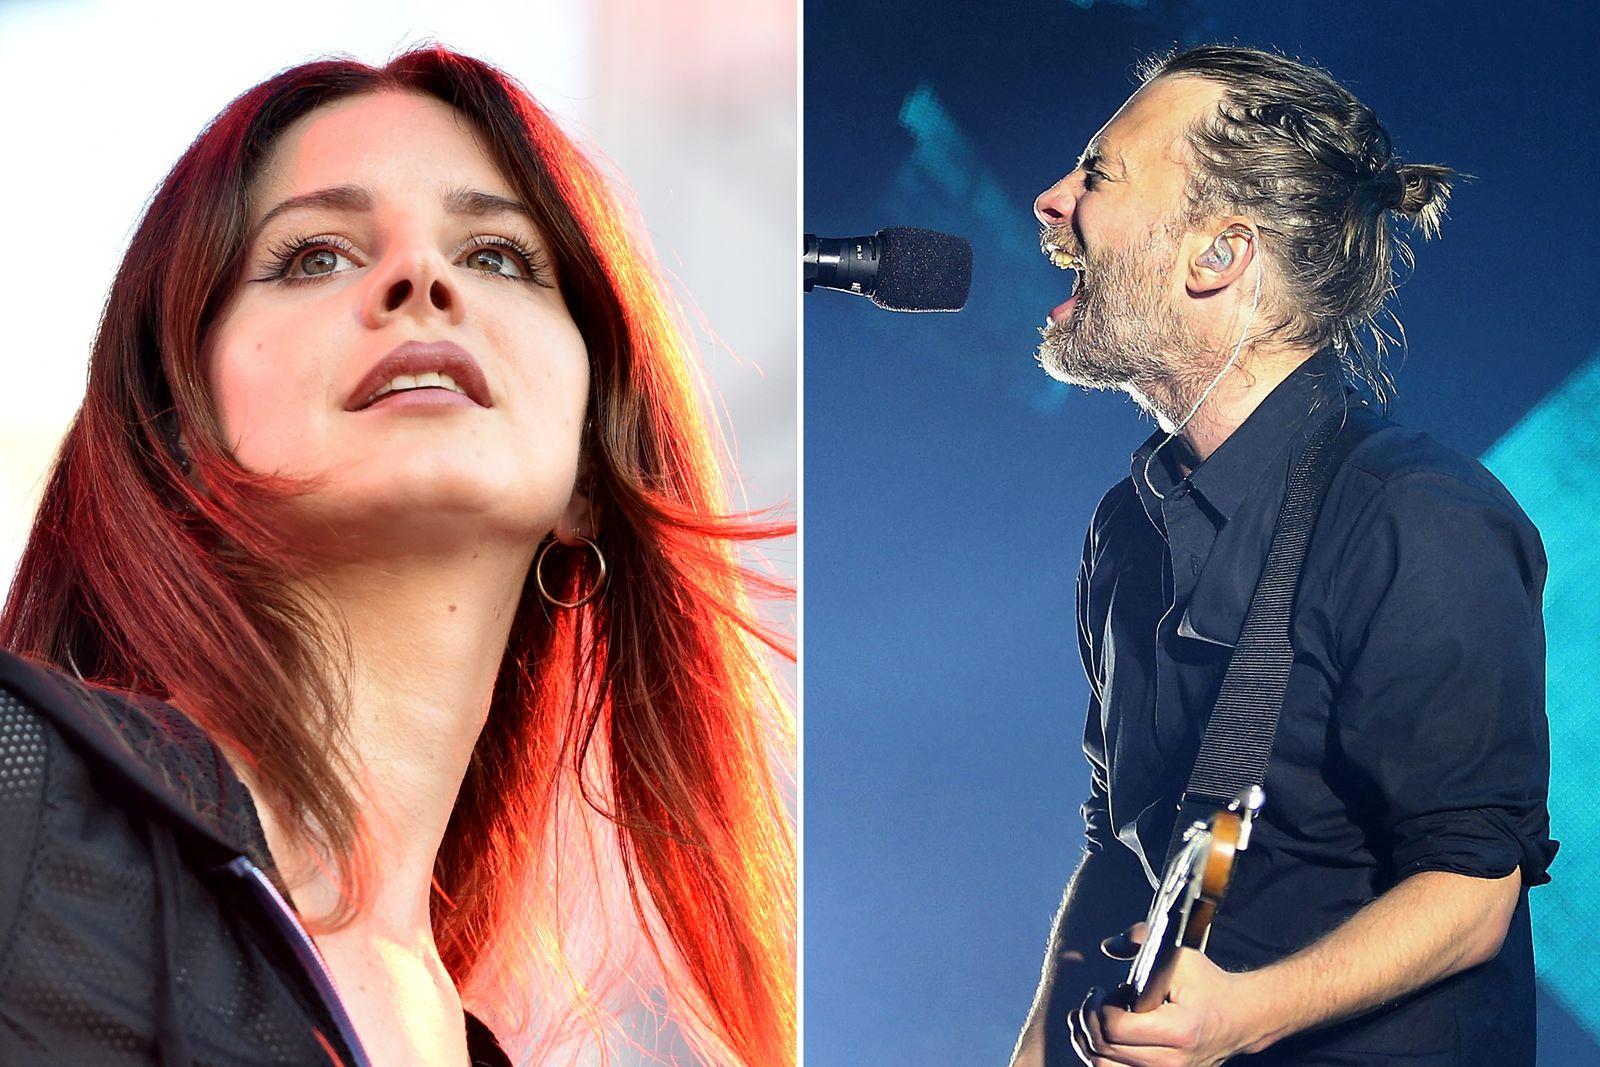 EINMALIGE VERWENDUNG Lana Del Rey vs. Radiohead KOMBO